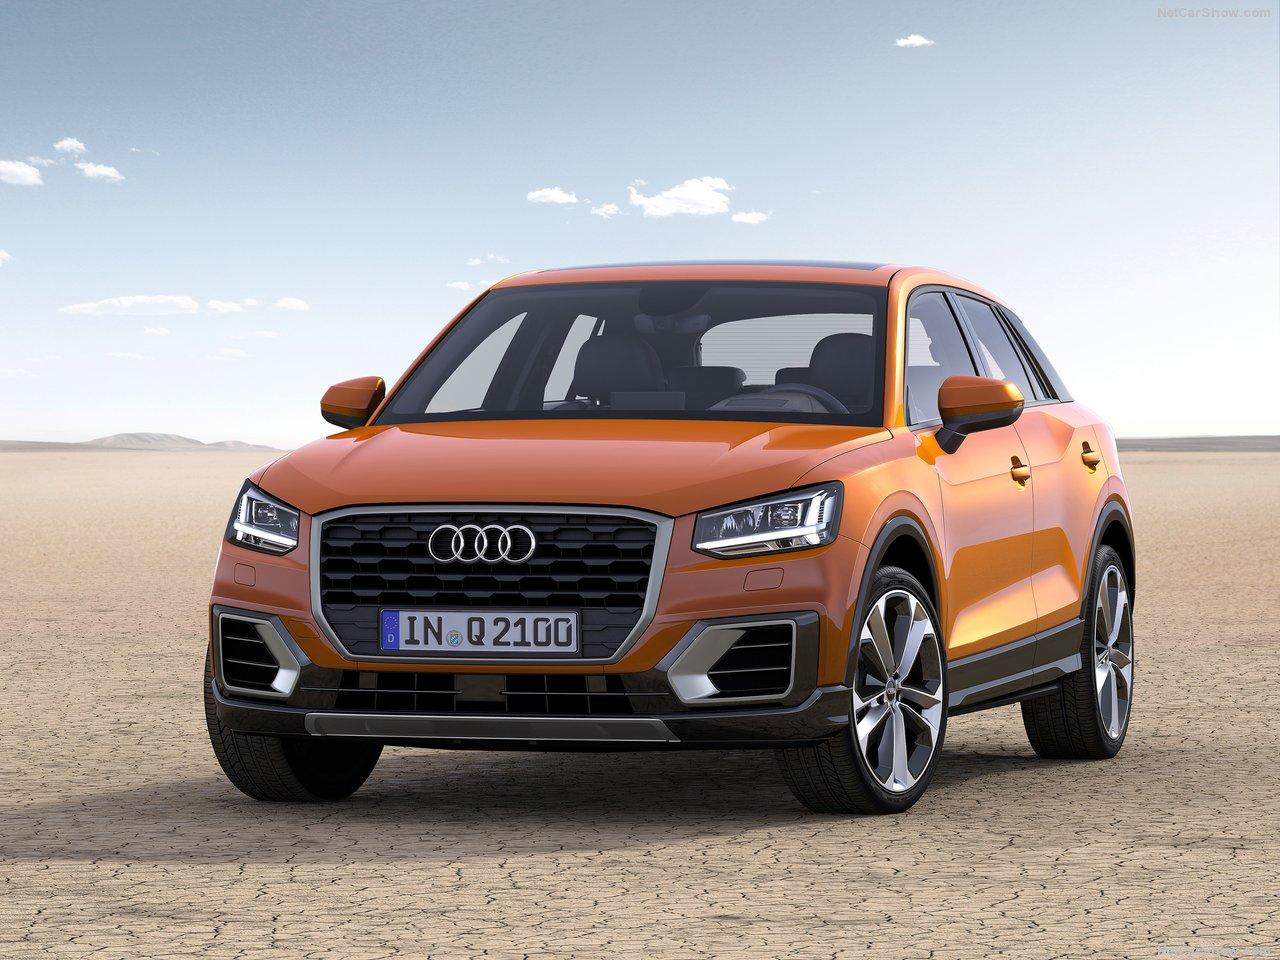 Audi-Q2-2017-1280-05.jpg